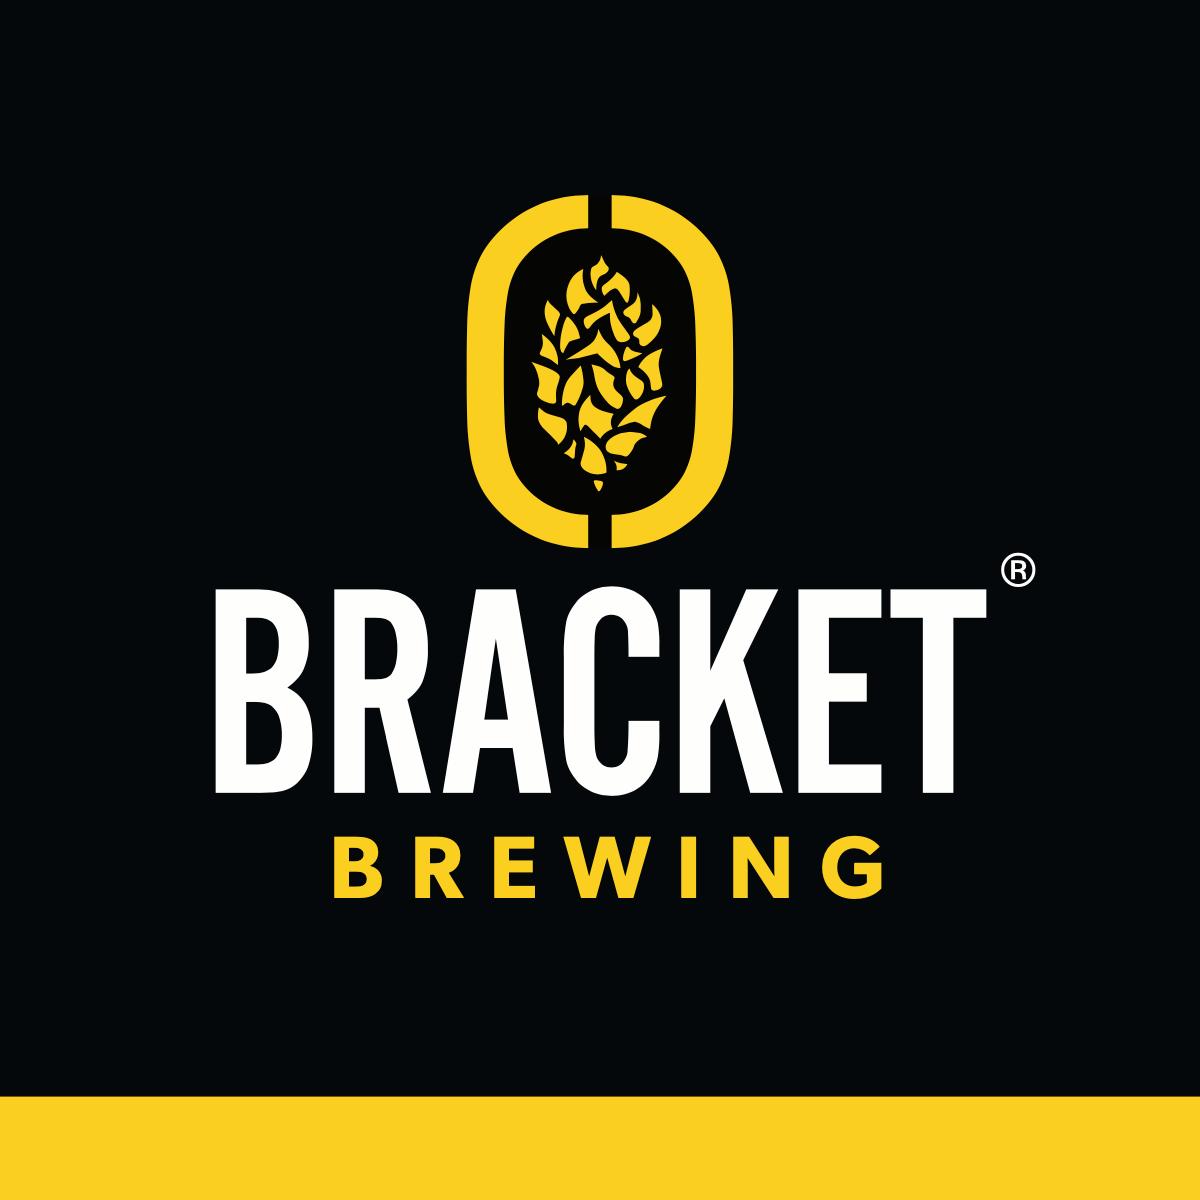 Bracket Brewing